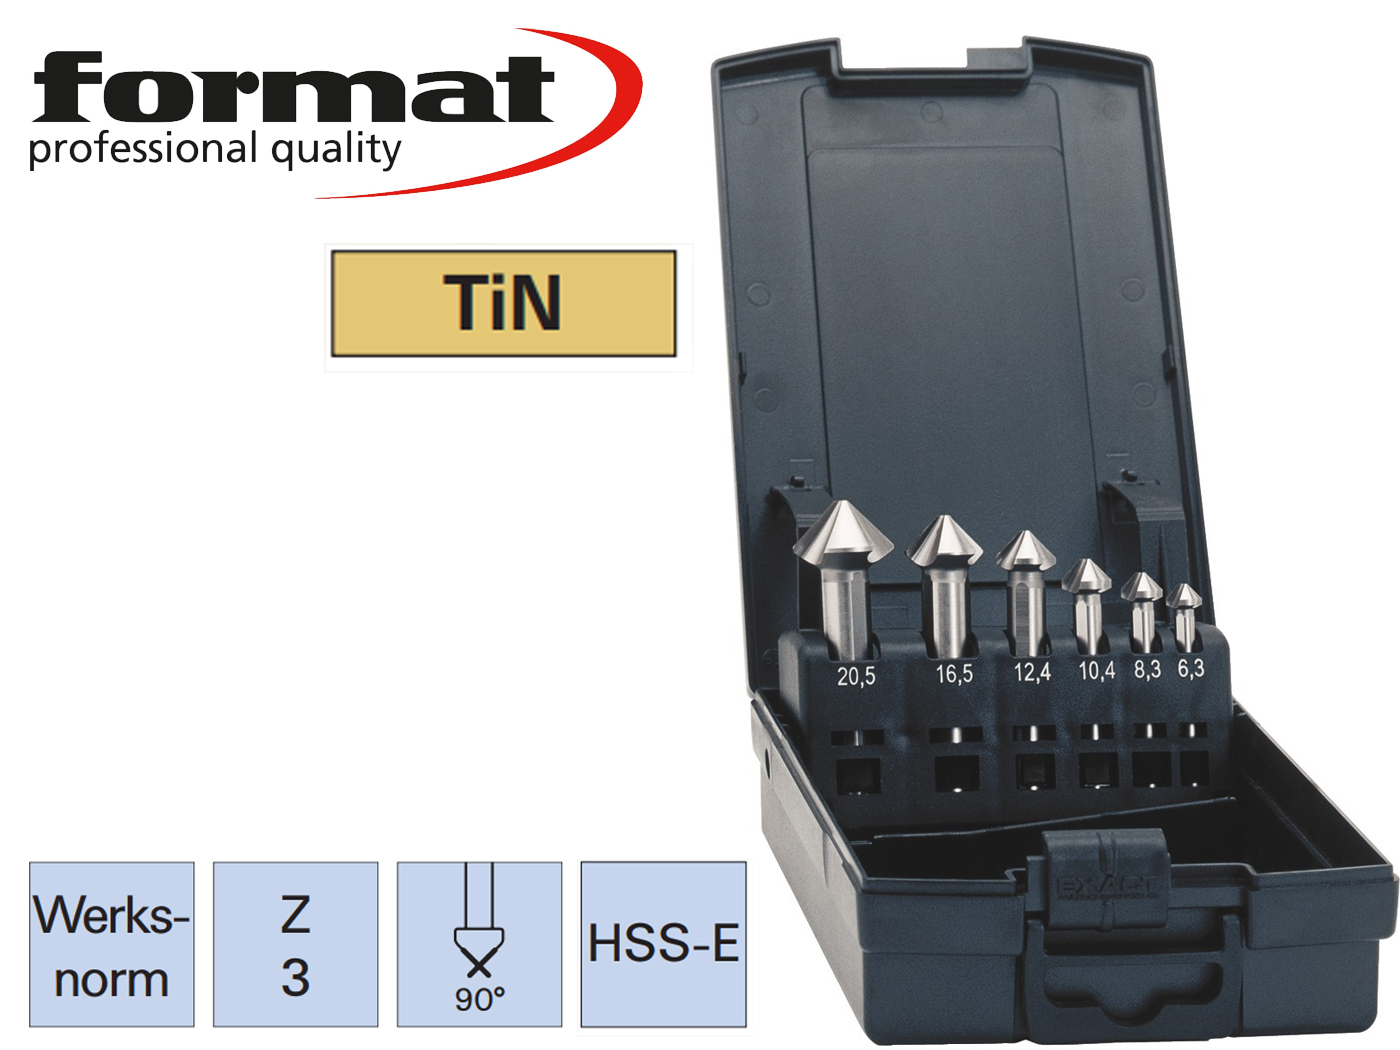 verzinkboor set DIN 335C HSS E TiN ADVANCED exact | DKMTools - DKM Tools